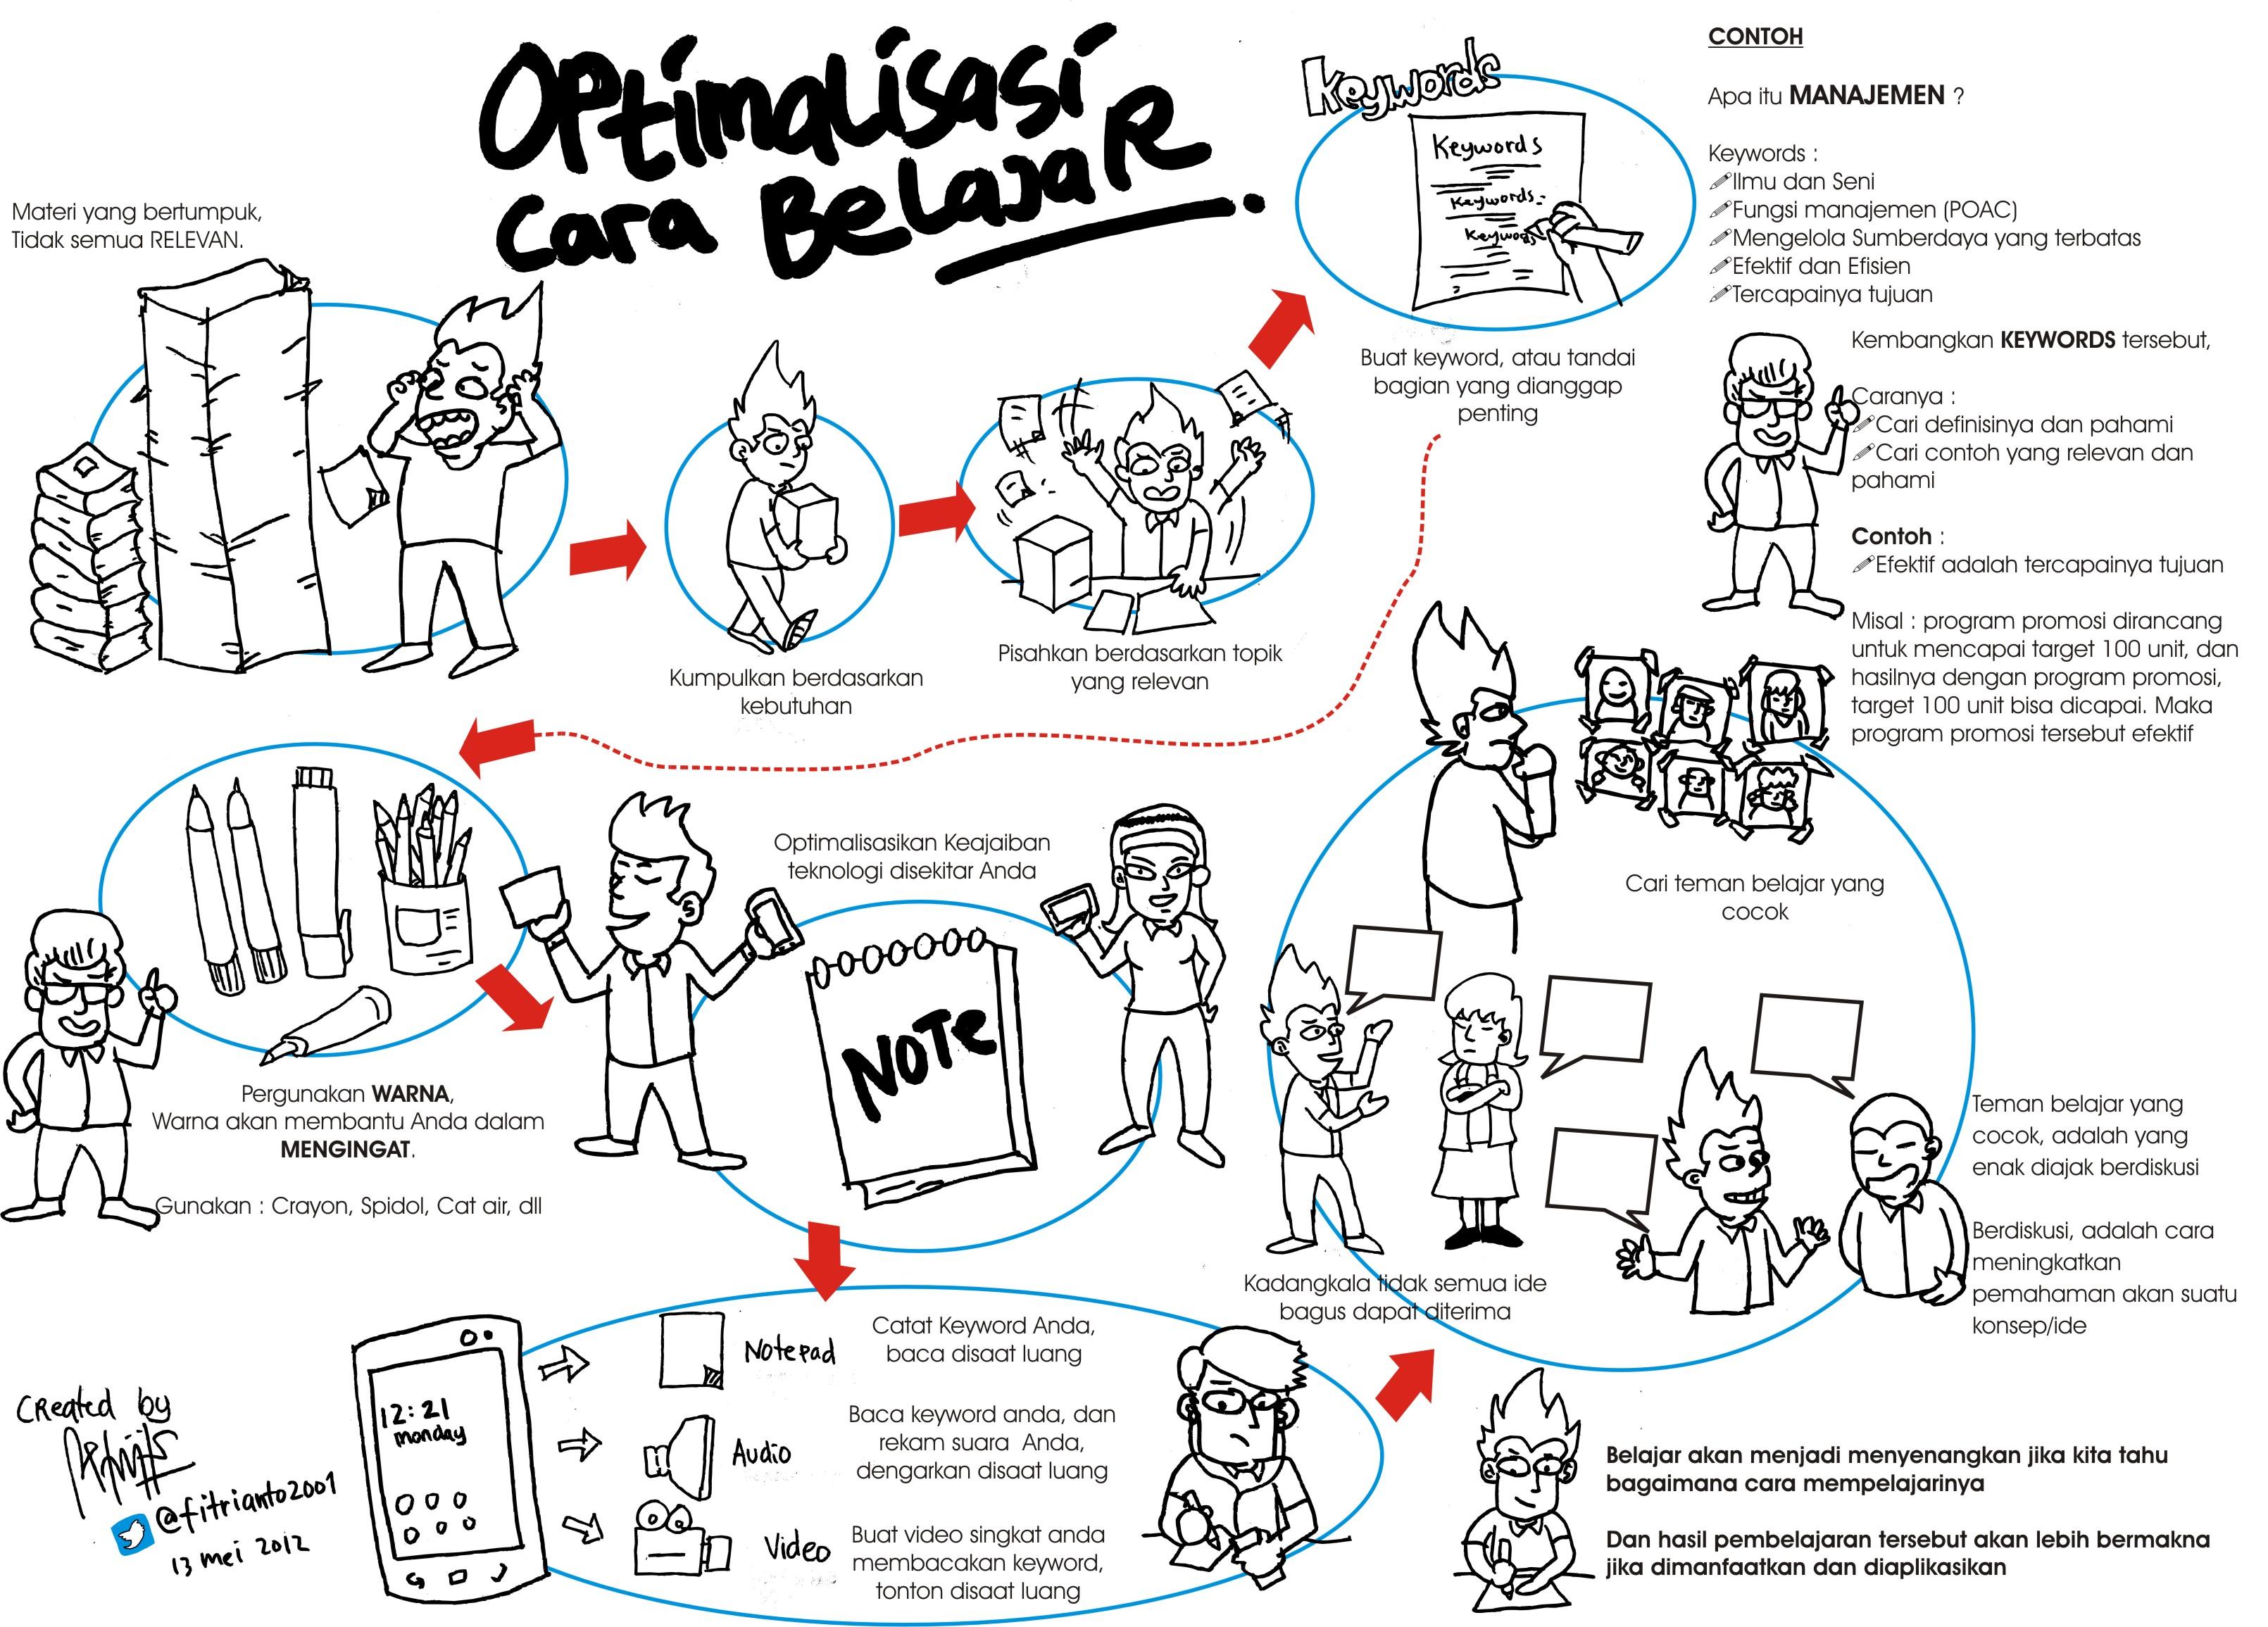 Metode Pembelajaran Picture Series Icefilmsinfo Globolister Karyaku Sket Gambar Coretan Dll Ruangidea Page 2